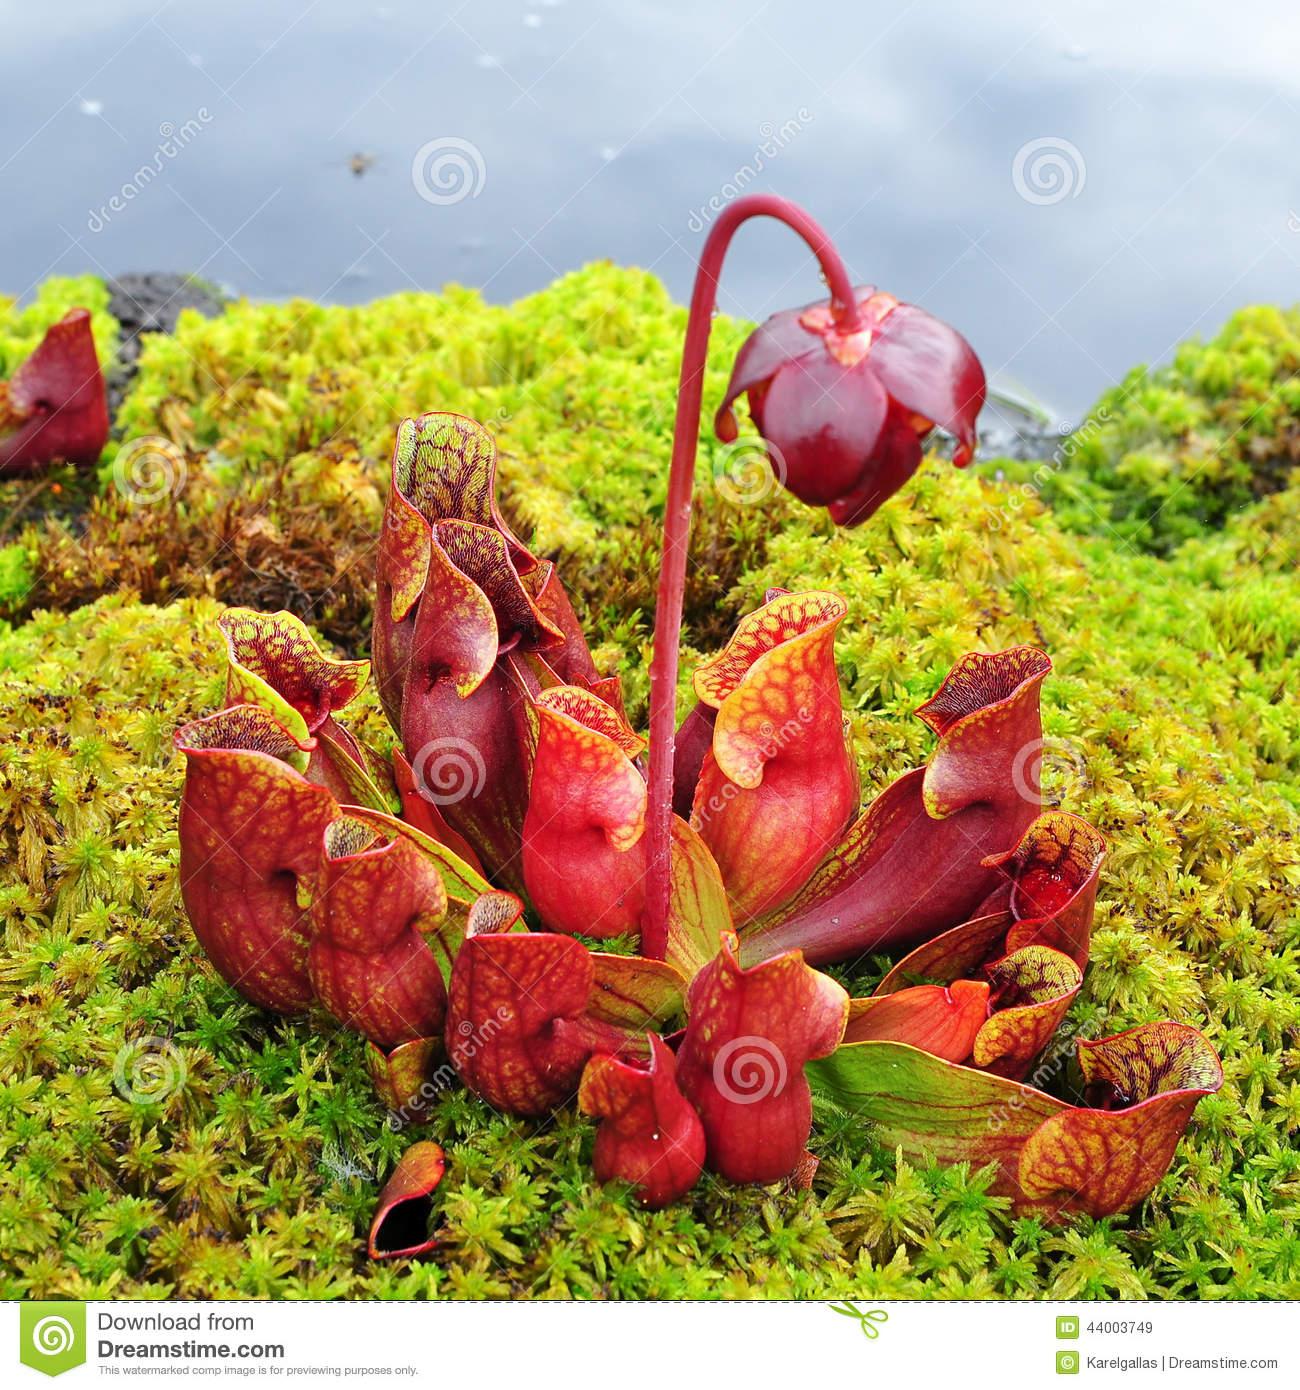 Sarracenia Purpurea Stock Photo.